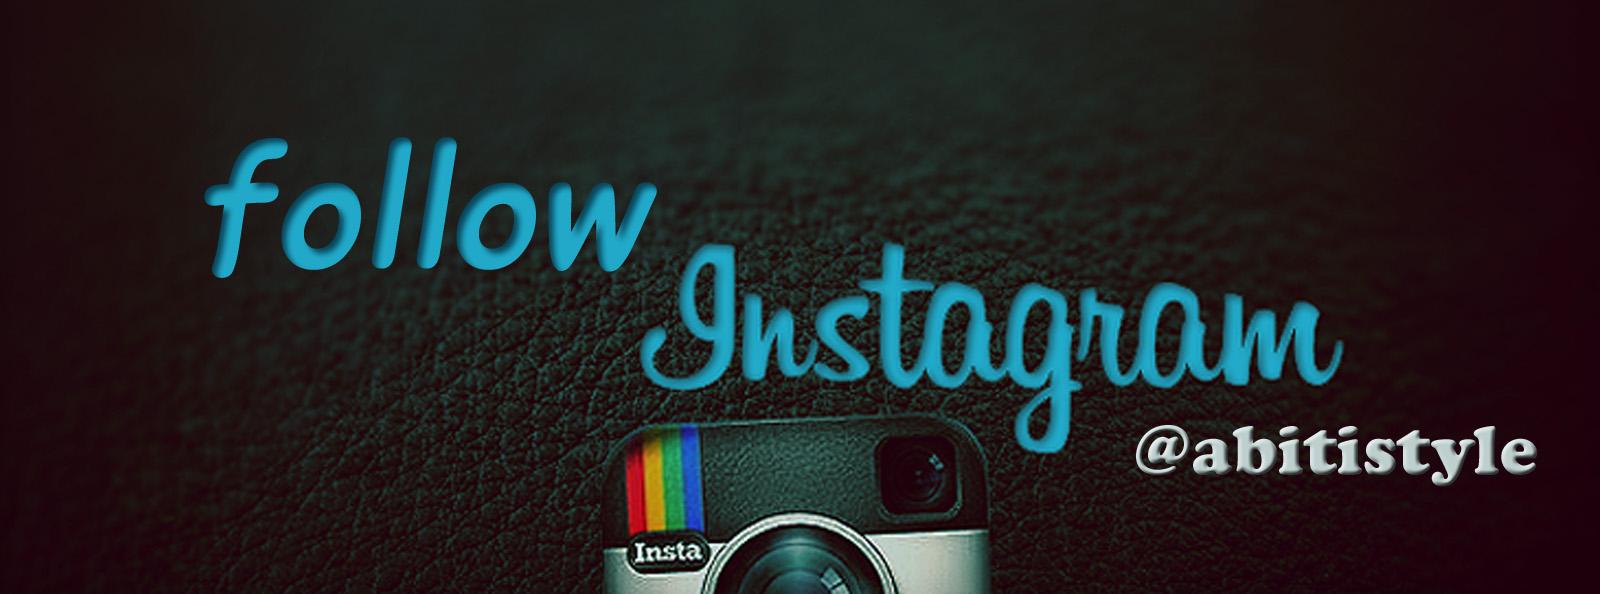 http://instagram.com/abitistyle